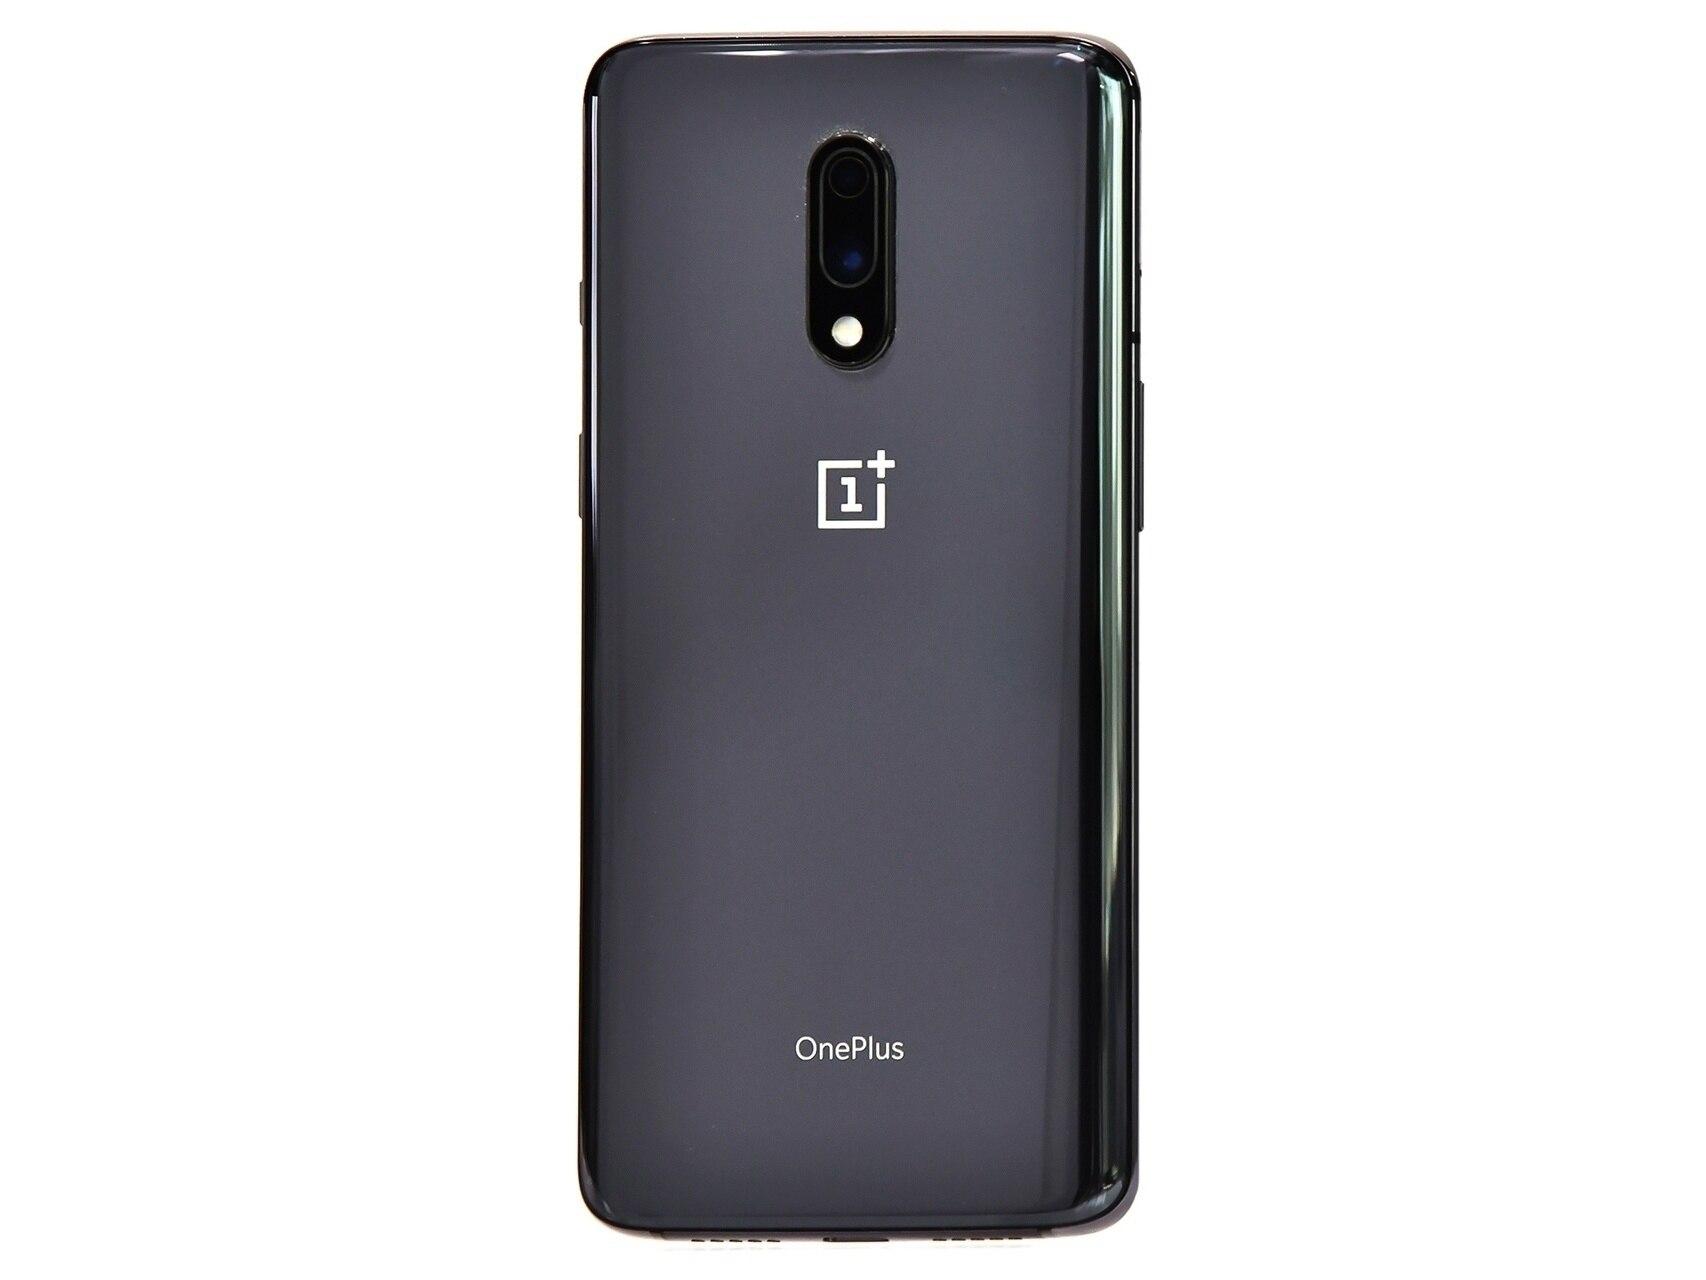 Фото3 - Смартфон Oneplus 7, ОЗУ 12 Гб, ПЗУ 256 ГБ, AMOLED экран 6,41 дюйма, Восьмиядерный процессор Snapdragon 855, 3700 мАч, NFC